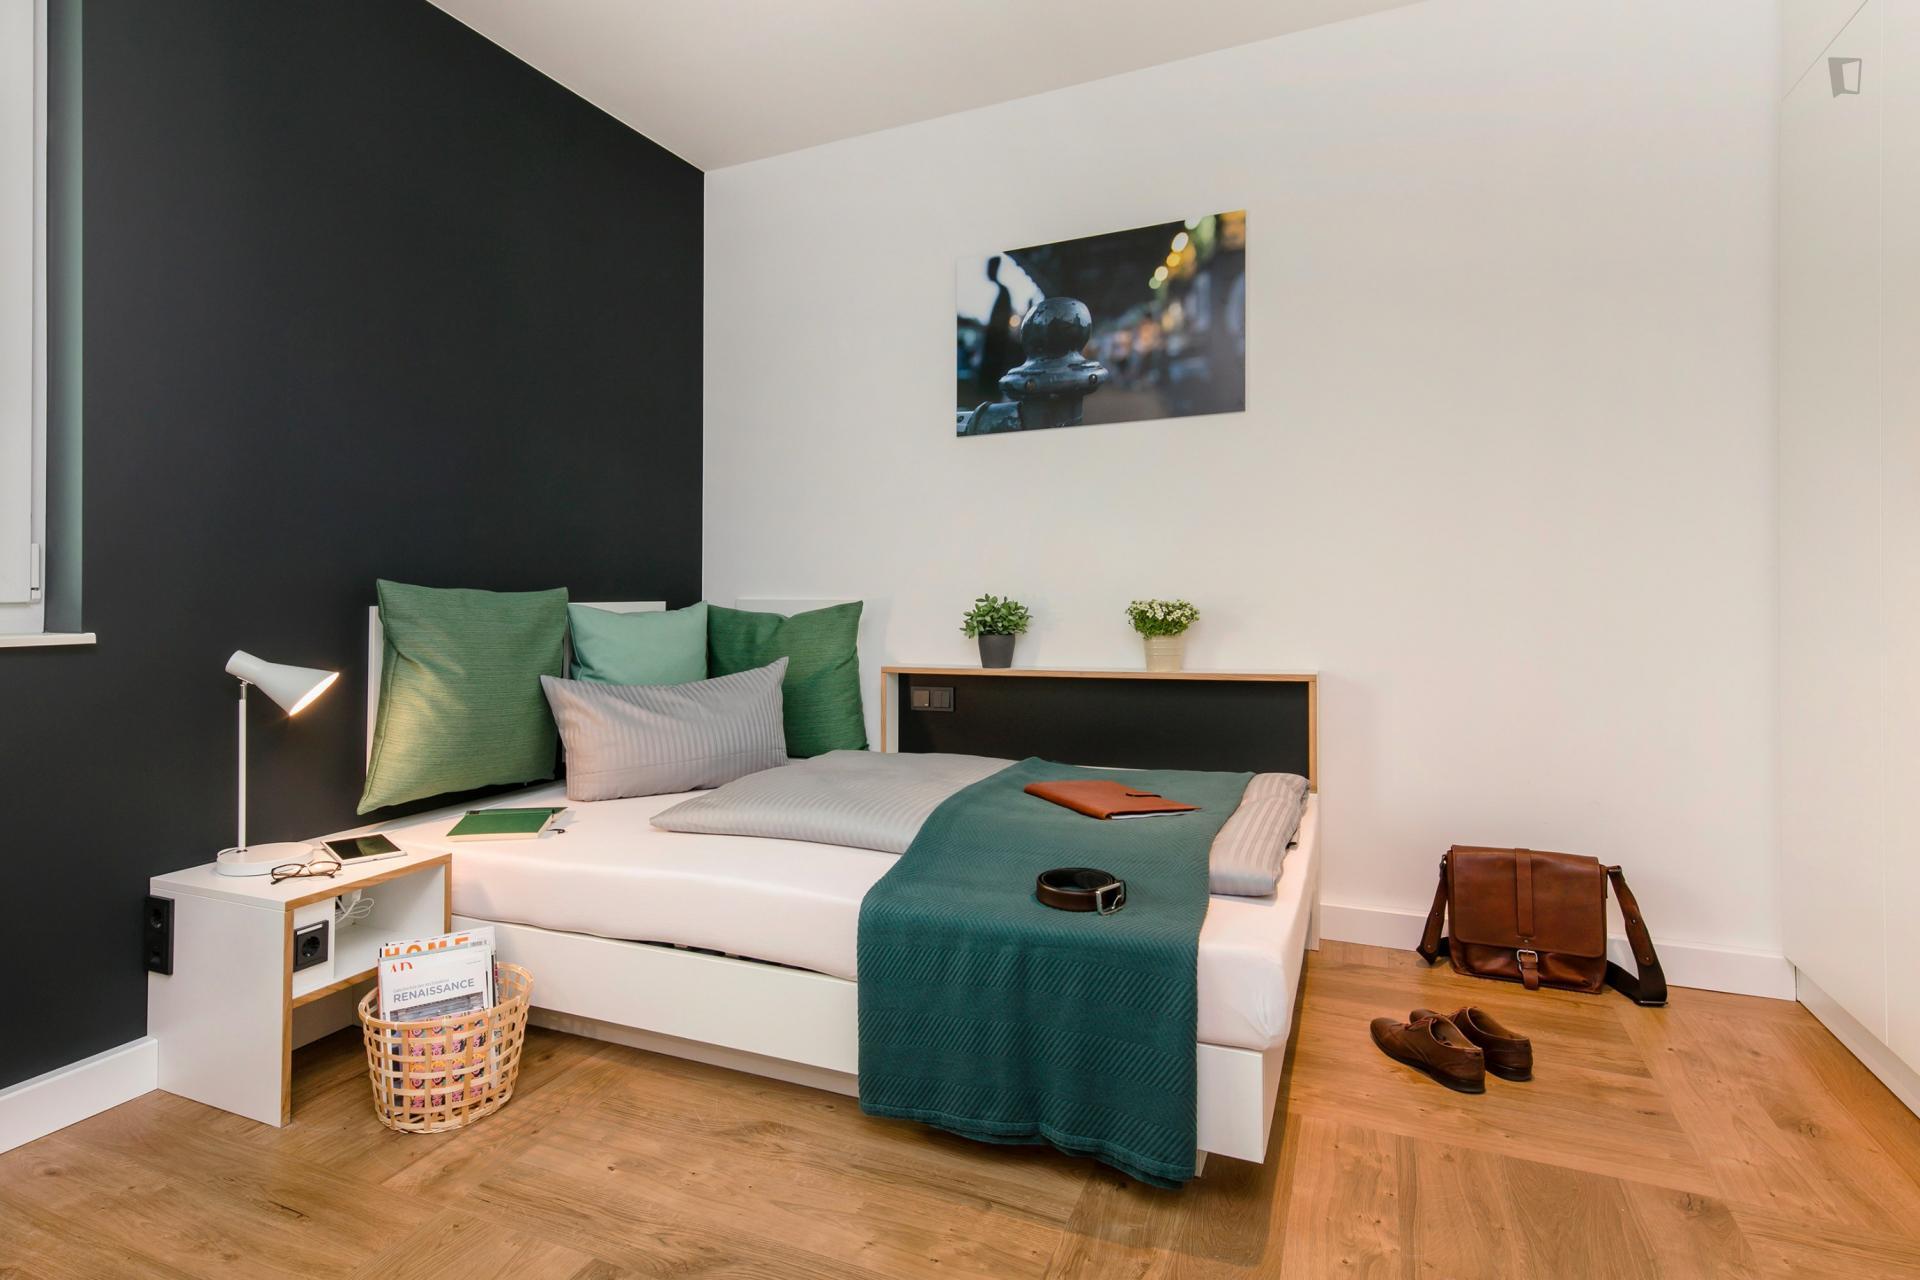 Storkower - Luxury studio in Berlin